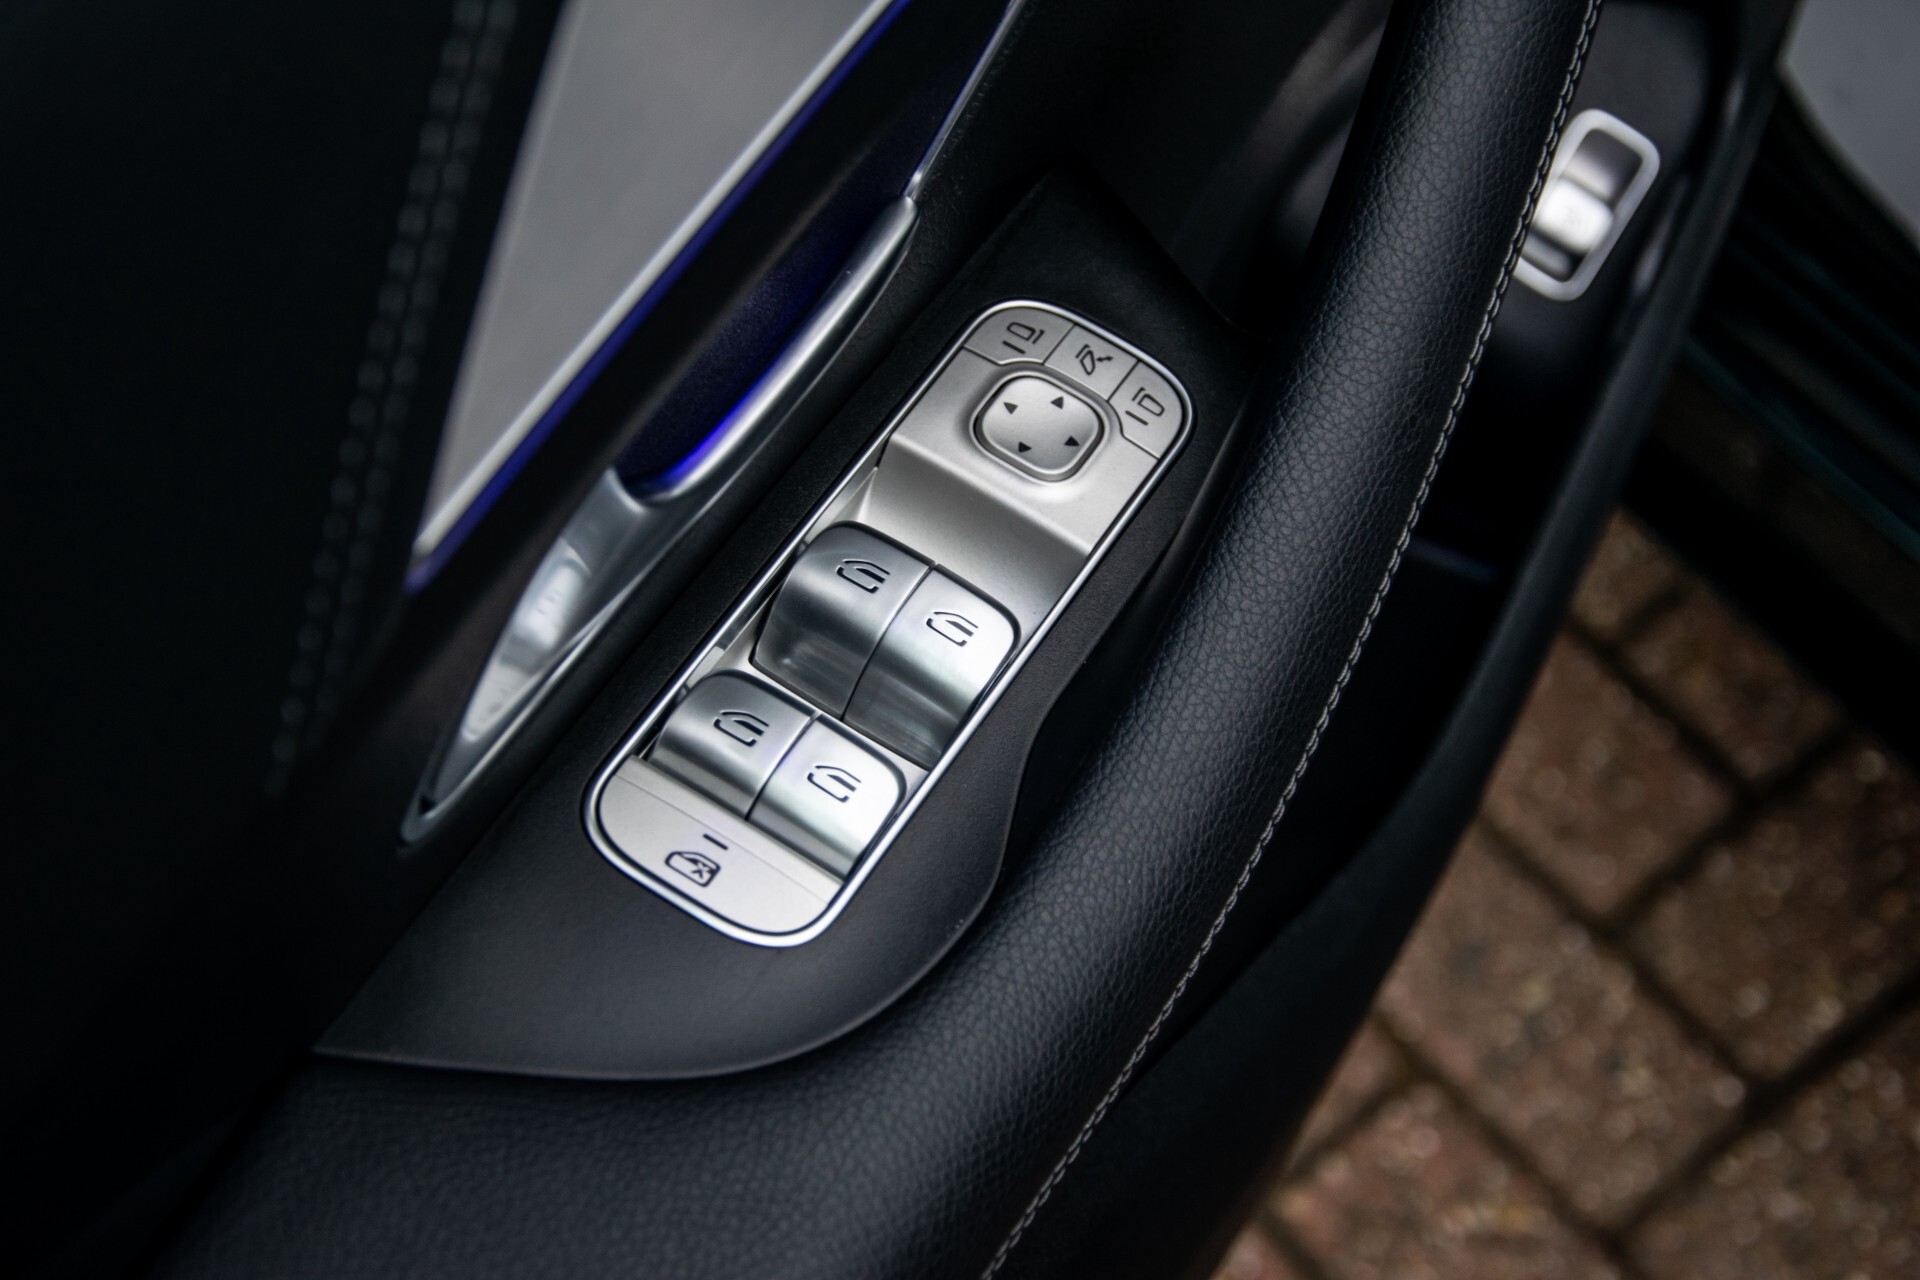 Mercedes-Benz GLE 450 4-M 7-Persoons AMG Massage/Rij-assist/Keyless/TV/360/Night/Trekhaak Aut9 Foto 29